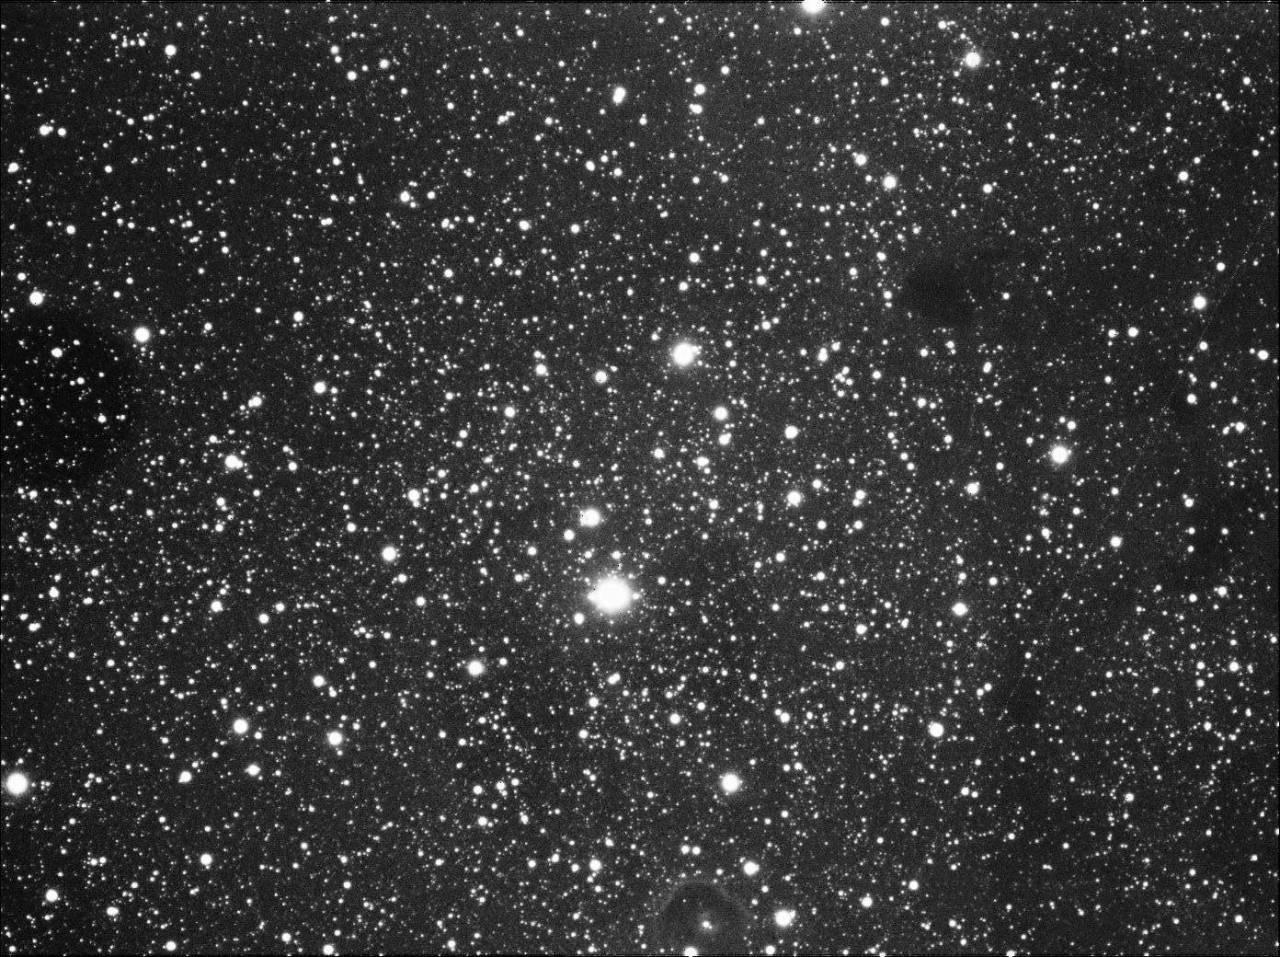 large.IC1396280918finishsmall.jpg.6f2d0dea0dd95c4c34bac12a88e8474e.jpg